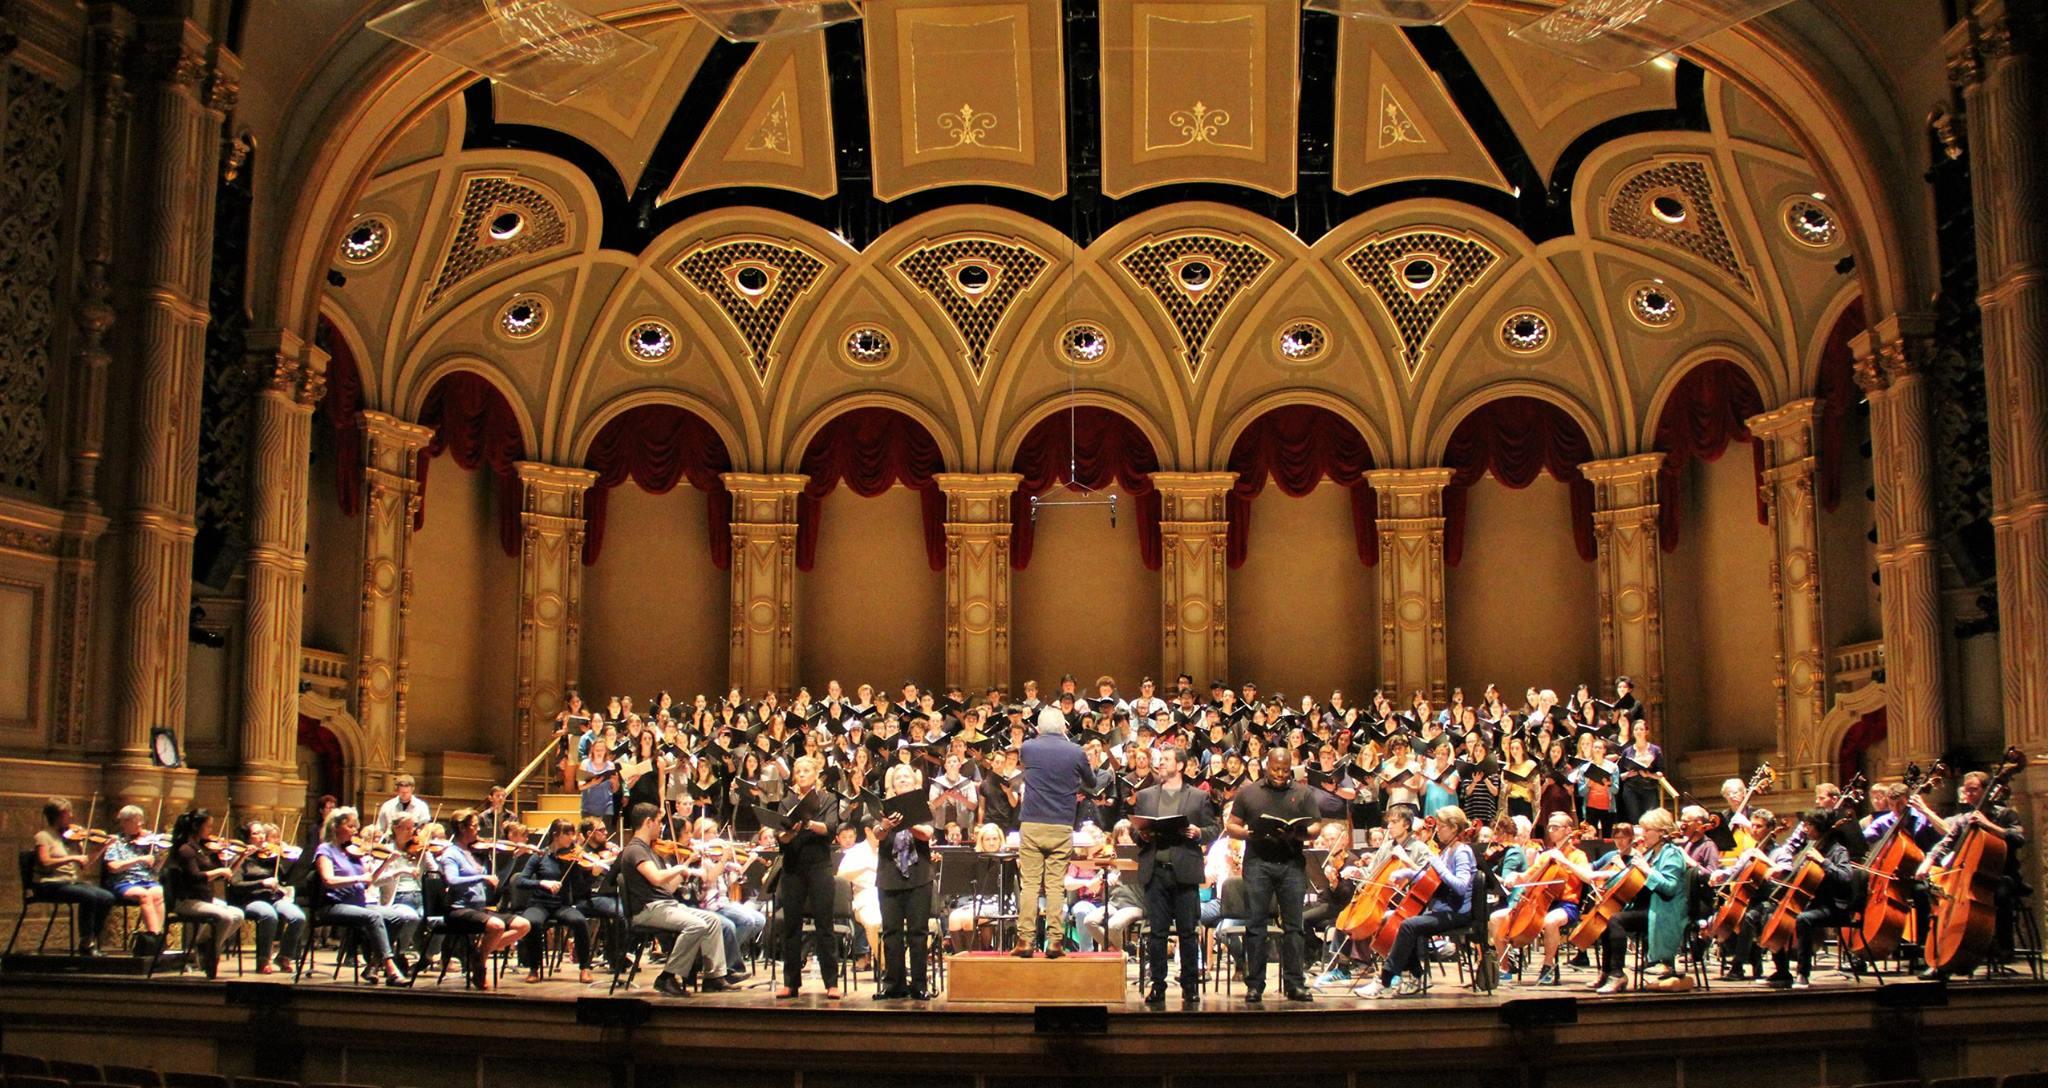 Photos courtesy of Vancouver Symphony